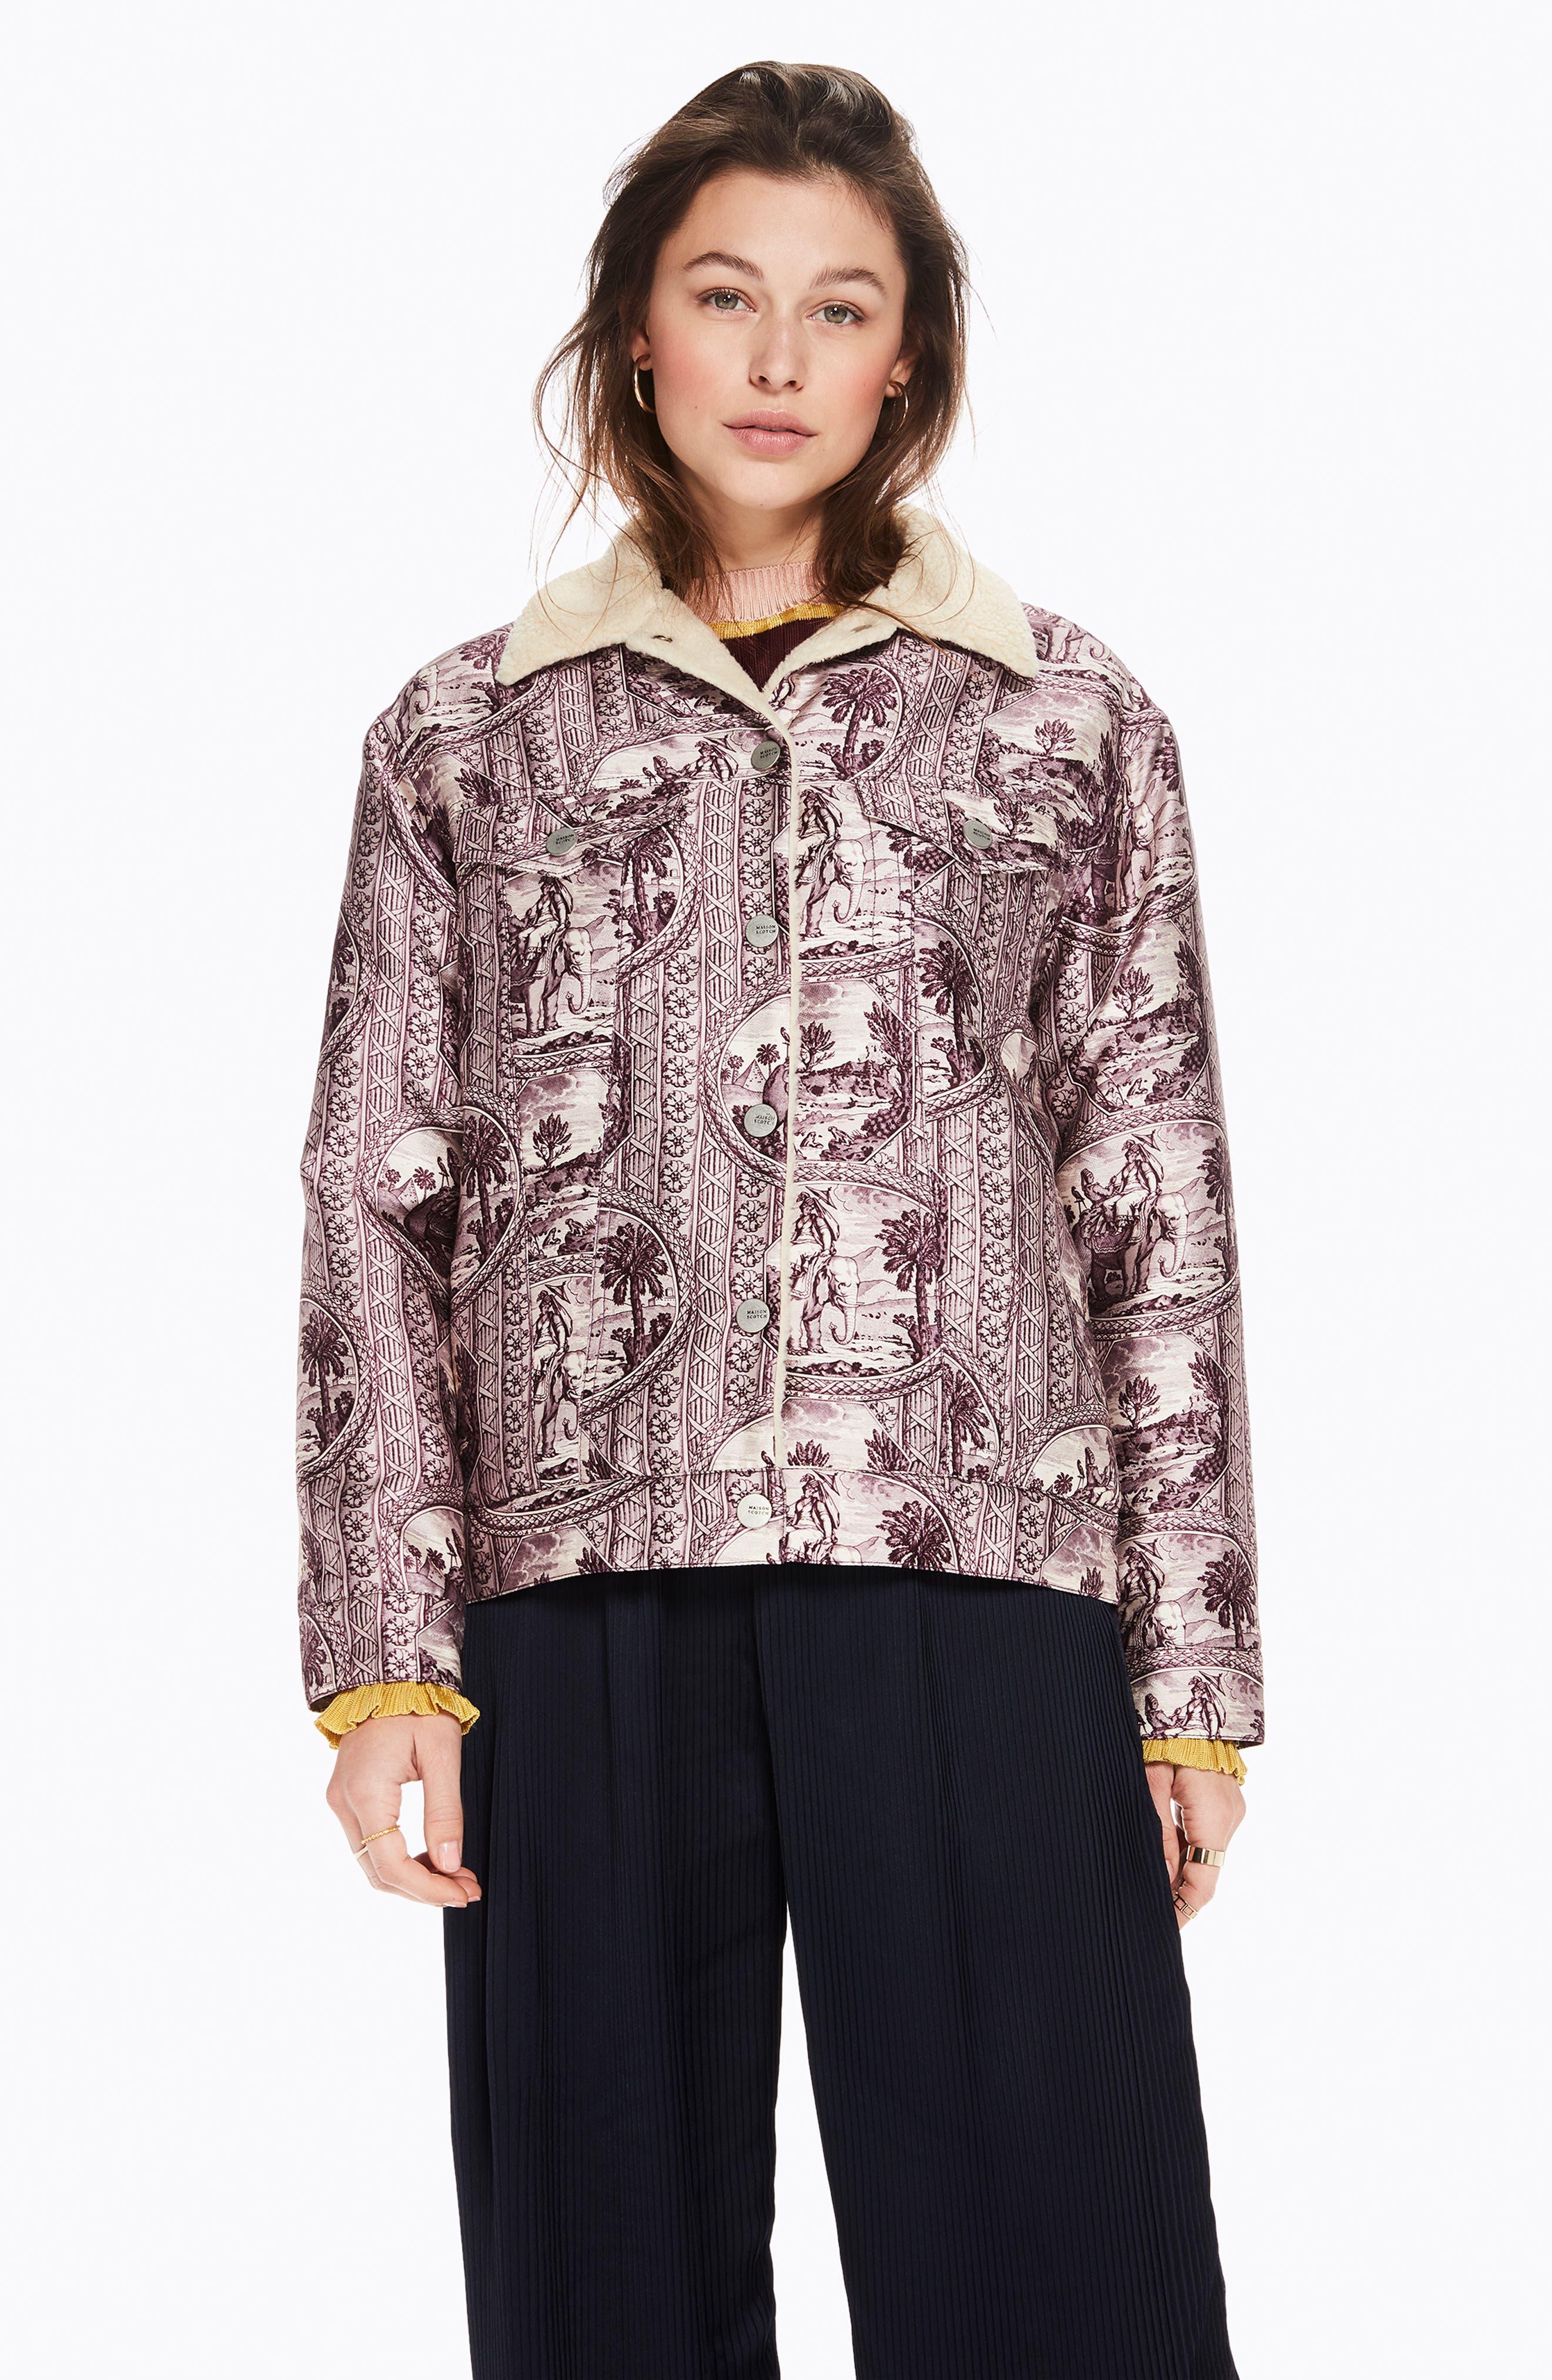 Fleece Lined Print Trucker Jacket,                             Alternate thumbnail 9, color,                             LILAC ELEPHANT PRINT